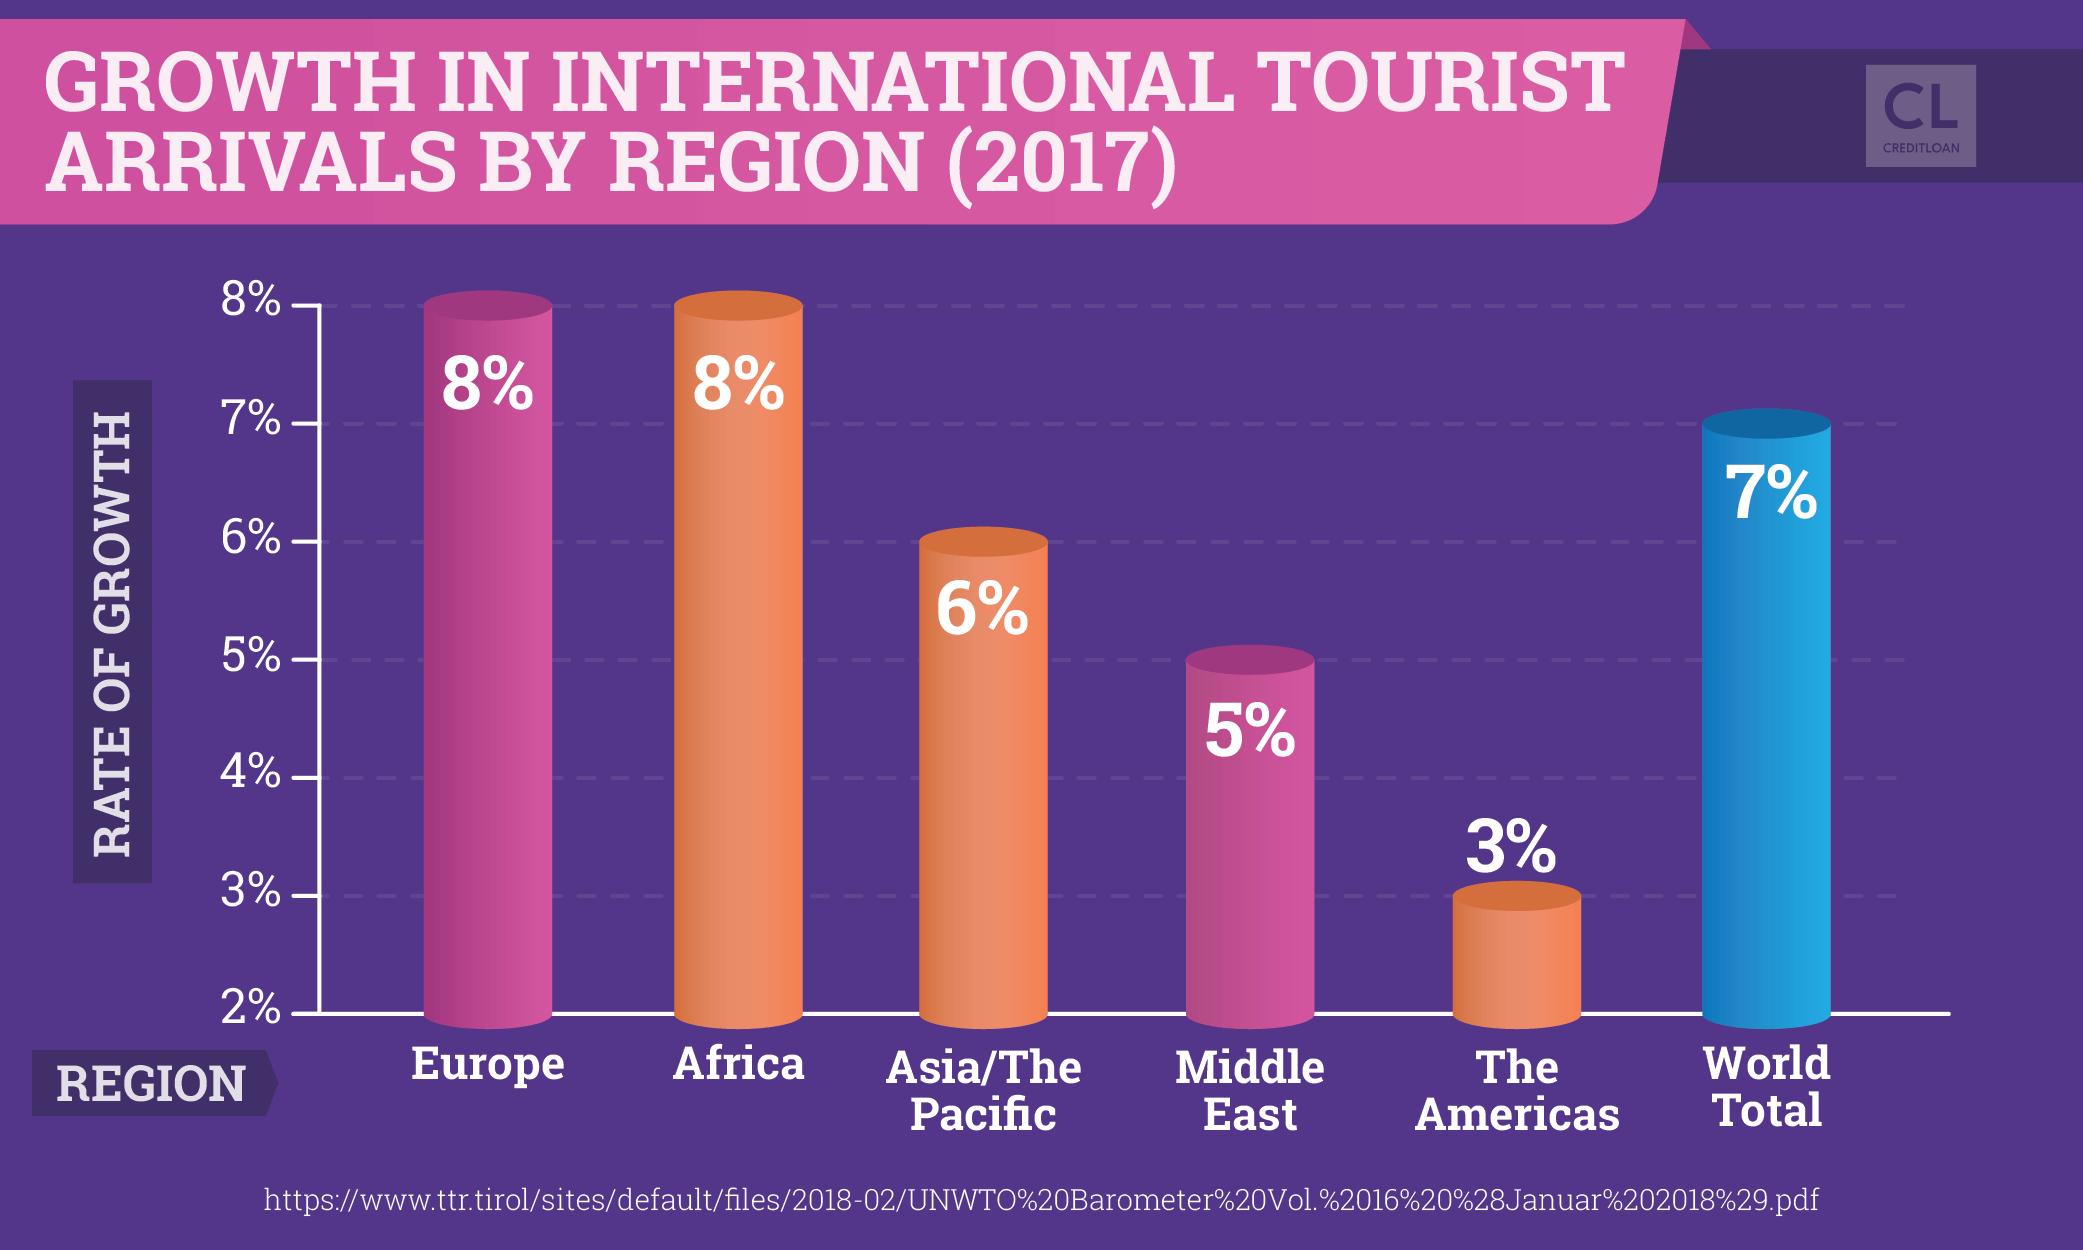 Growth in International Tourist Arrivals by Region (2017)